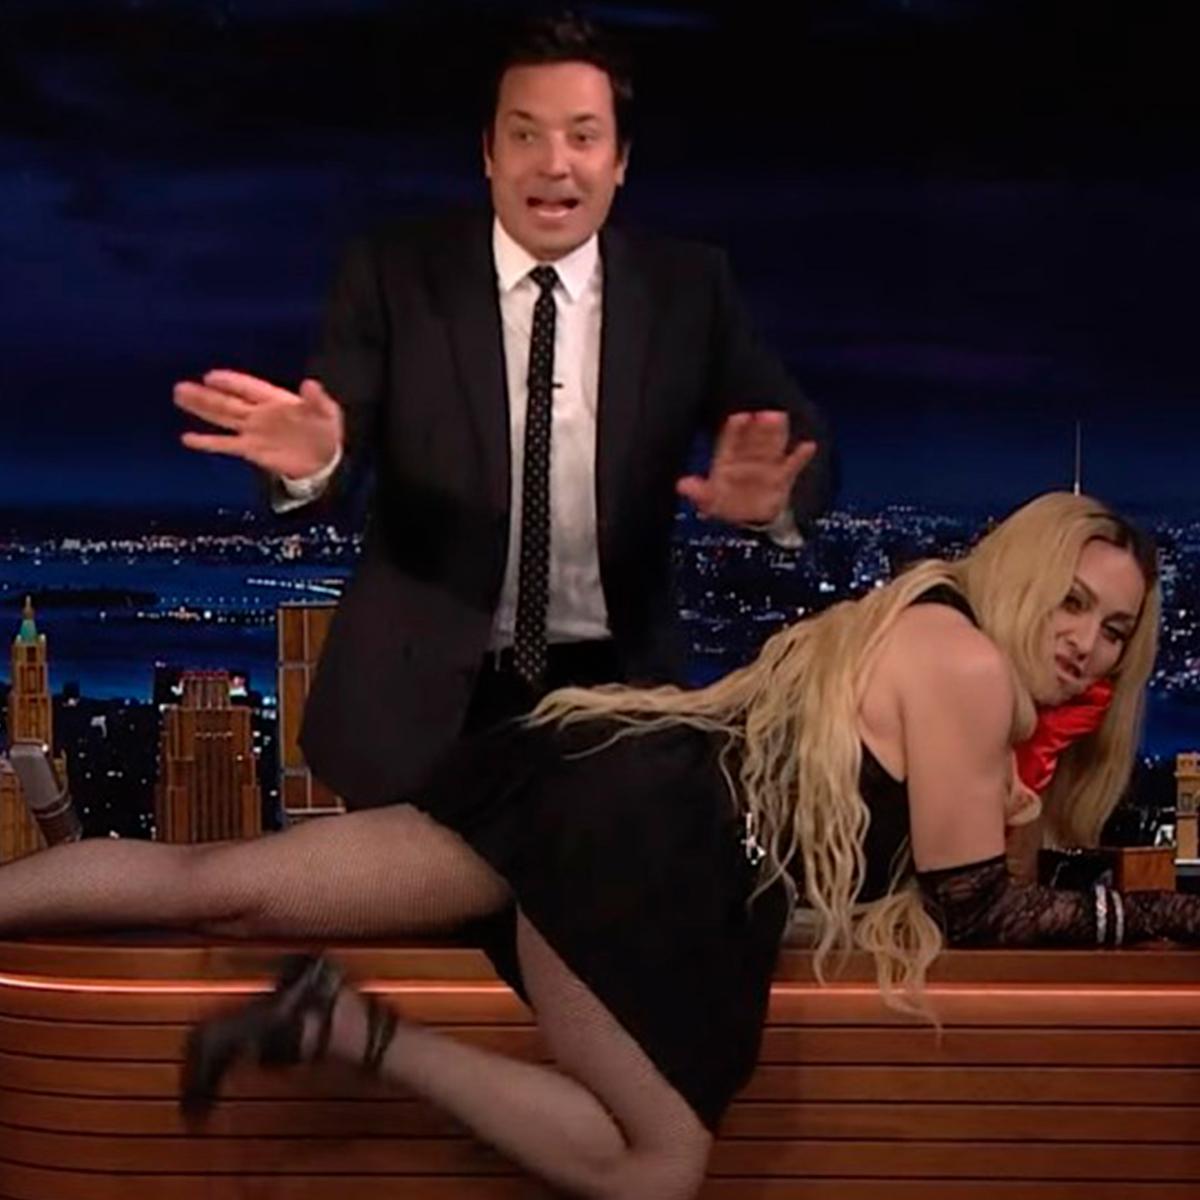 Madonna Jimmy Fallon's